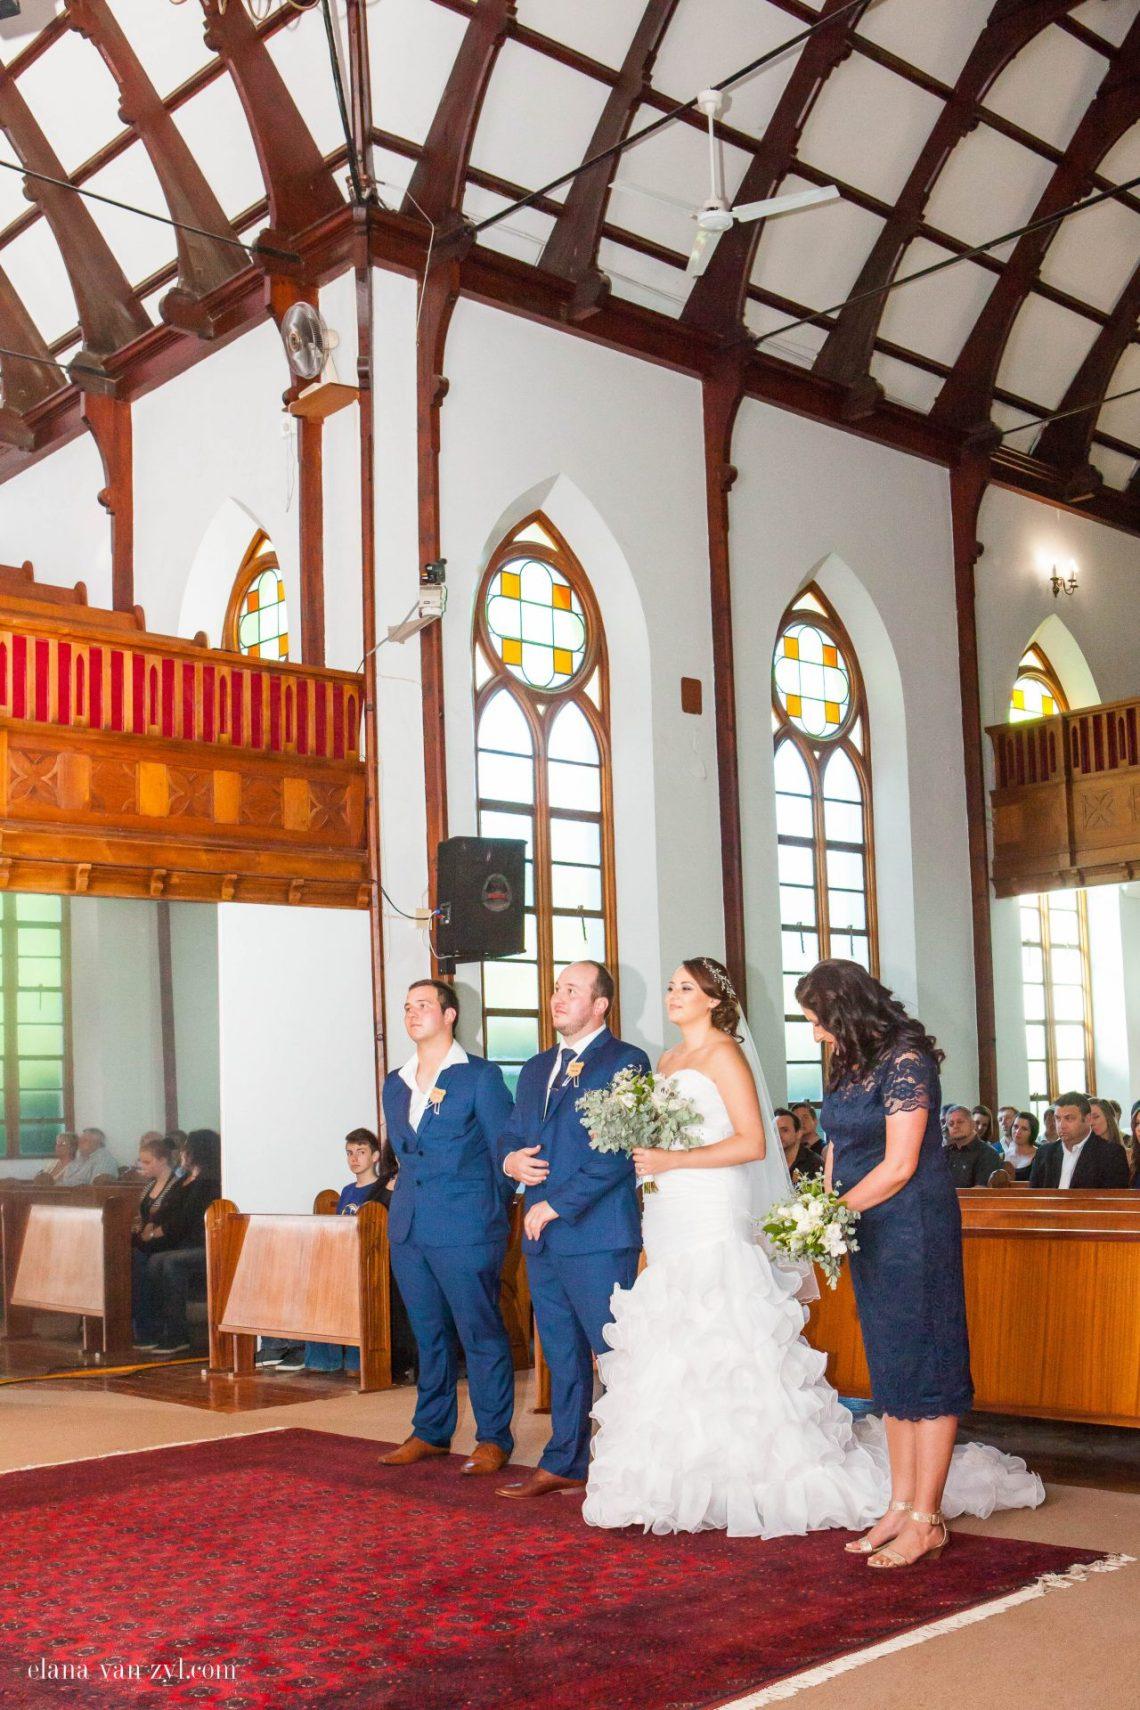 nelmari-emil-bergland-wedding_elana-van-zyl-photography-3851